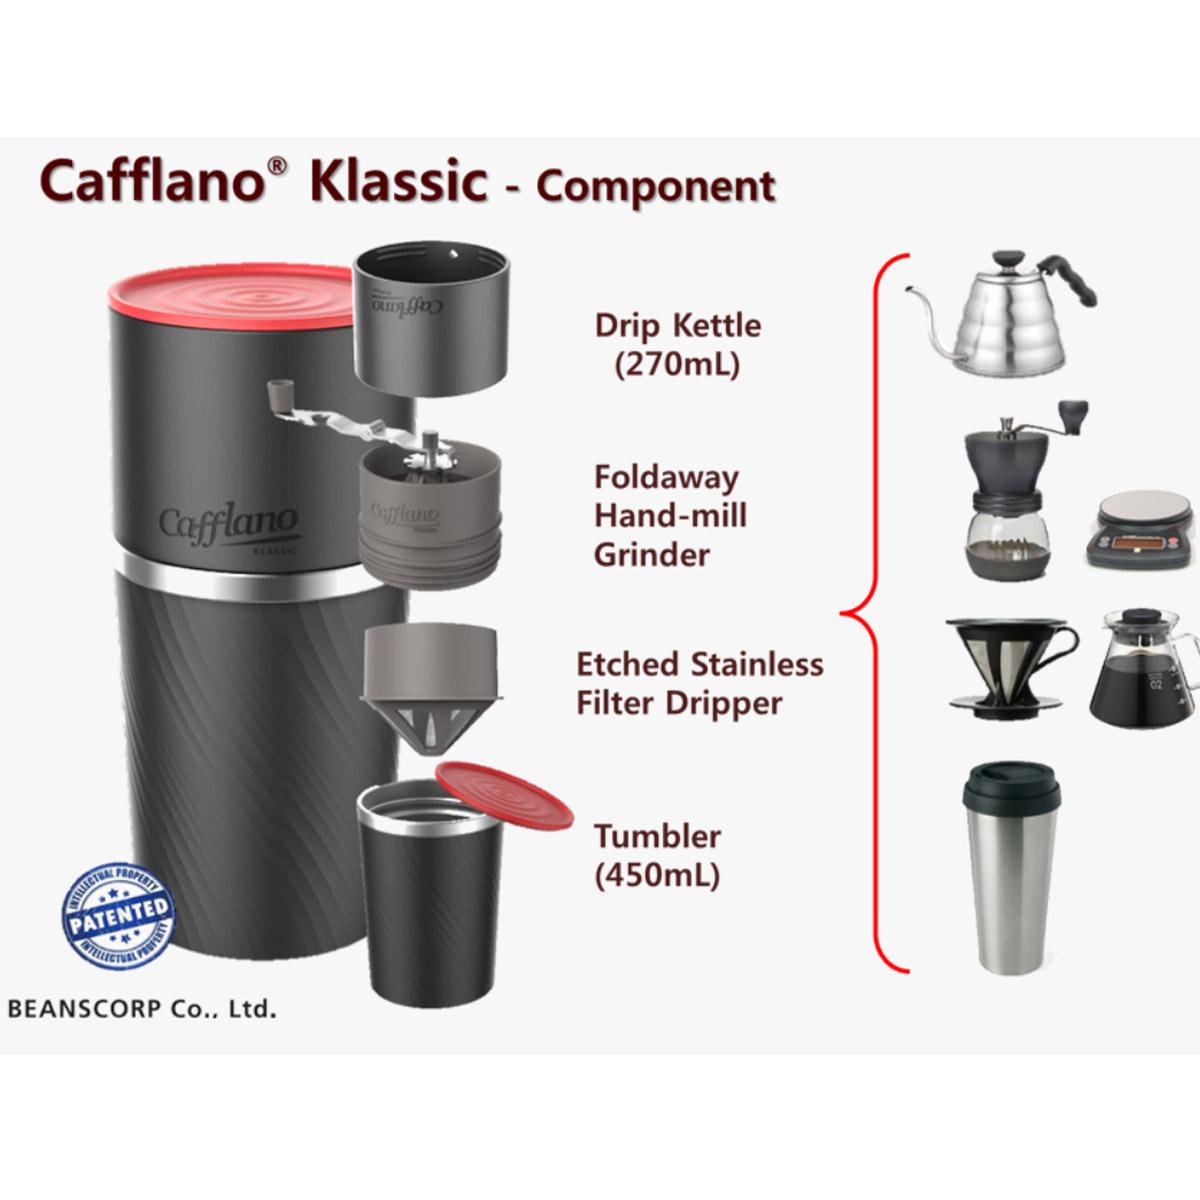 cafflano-klassic-technologie